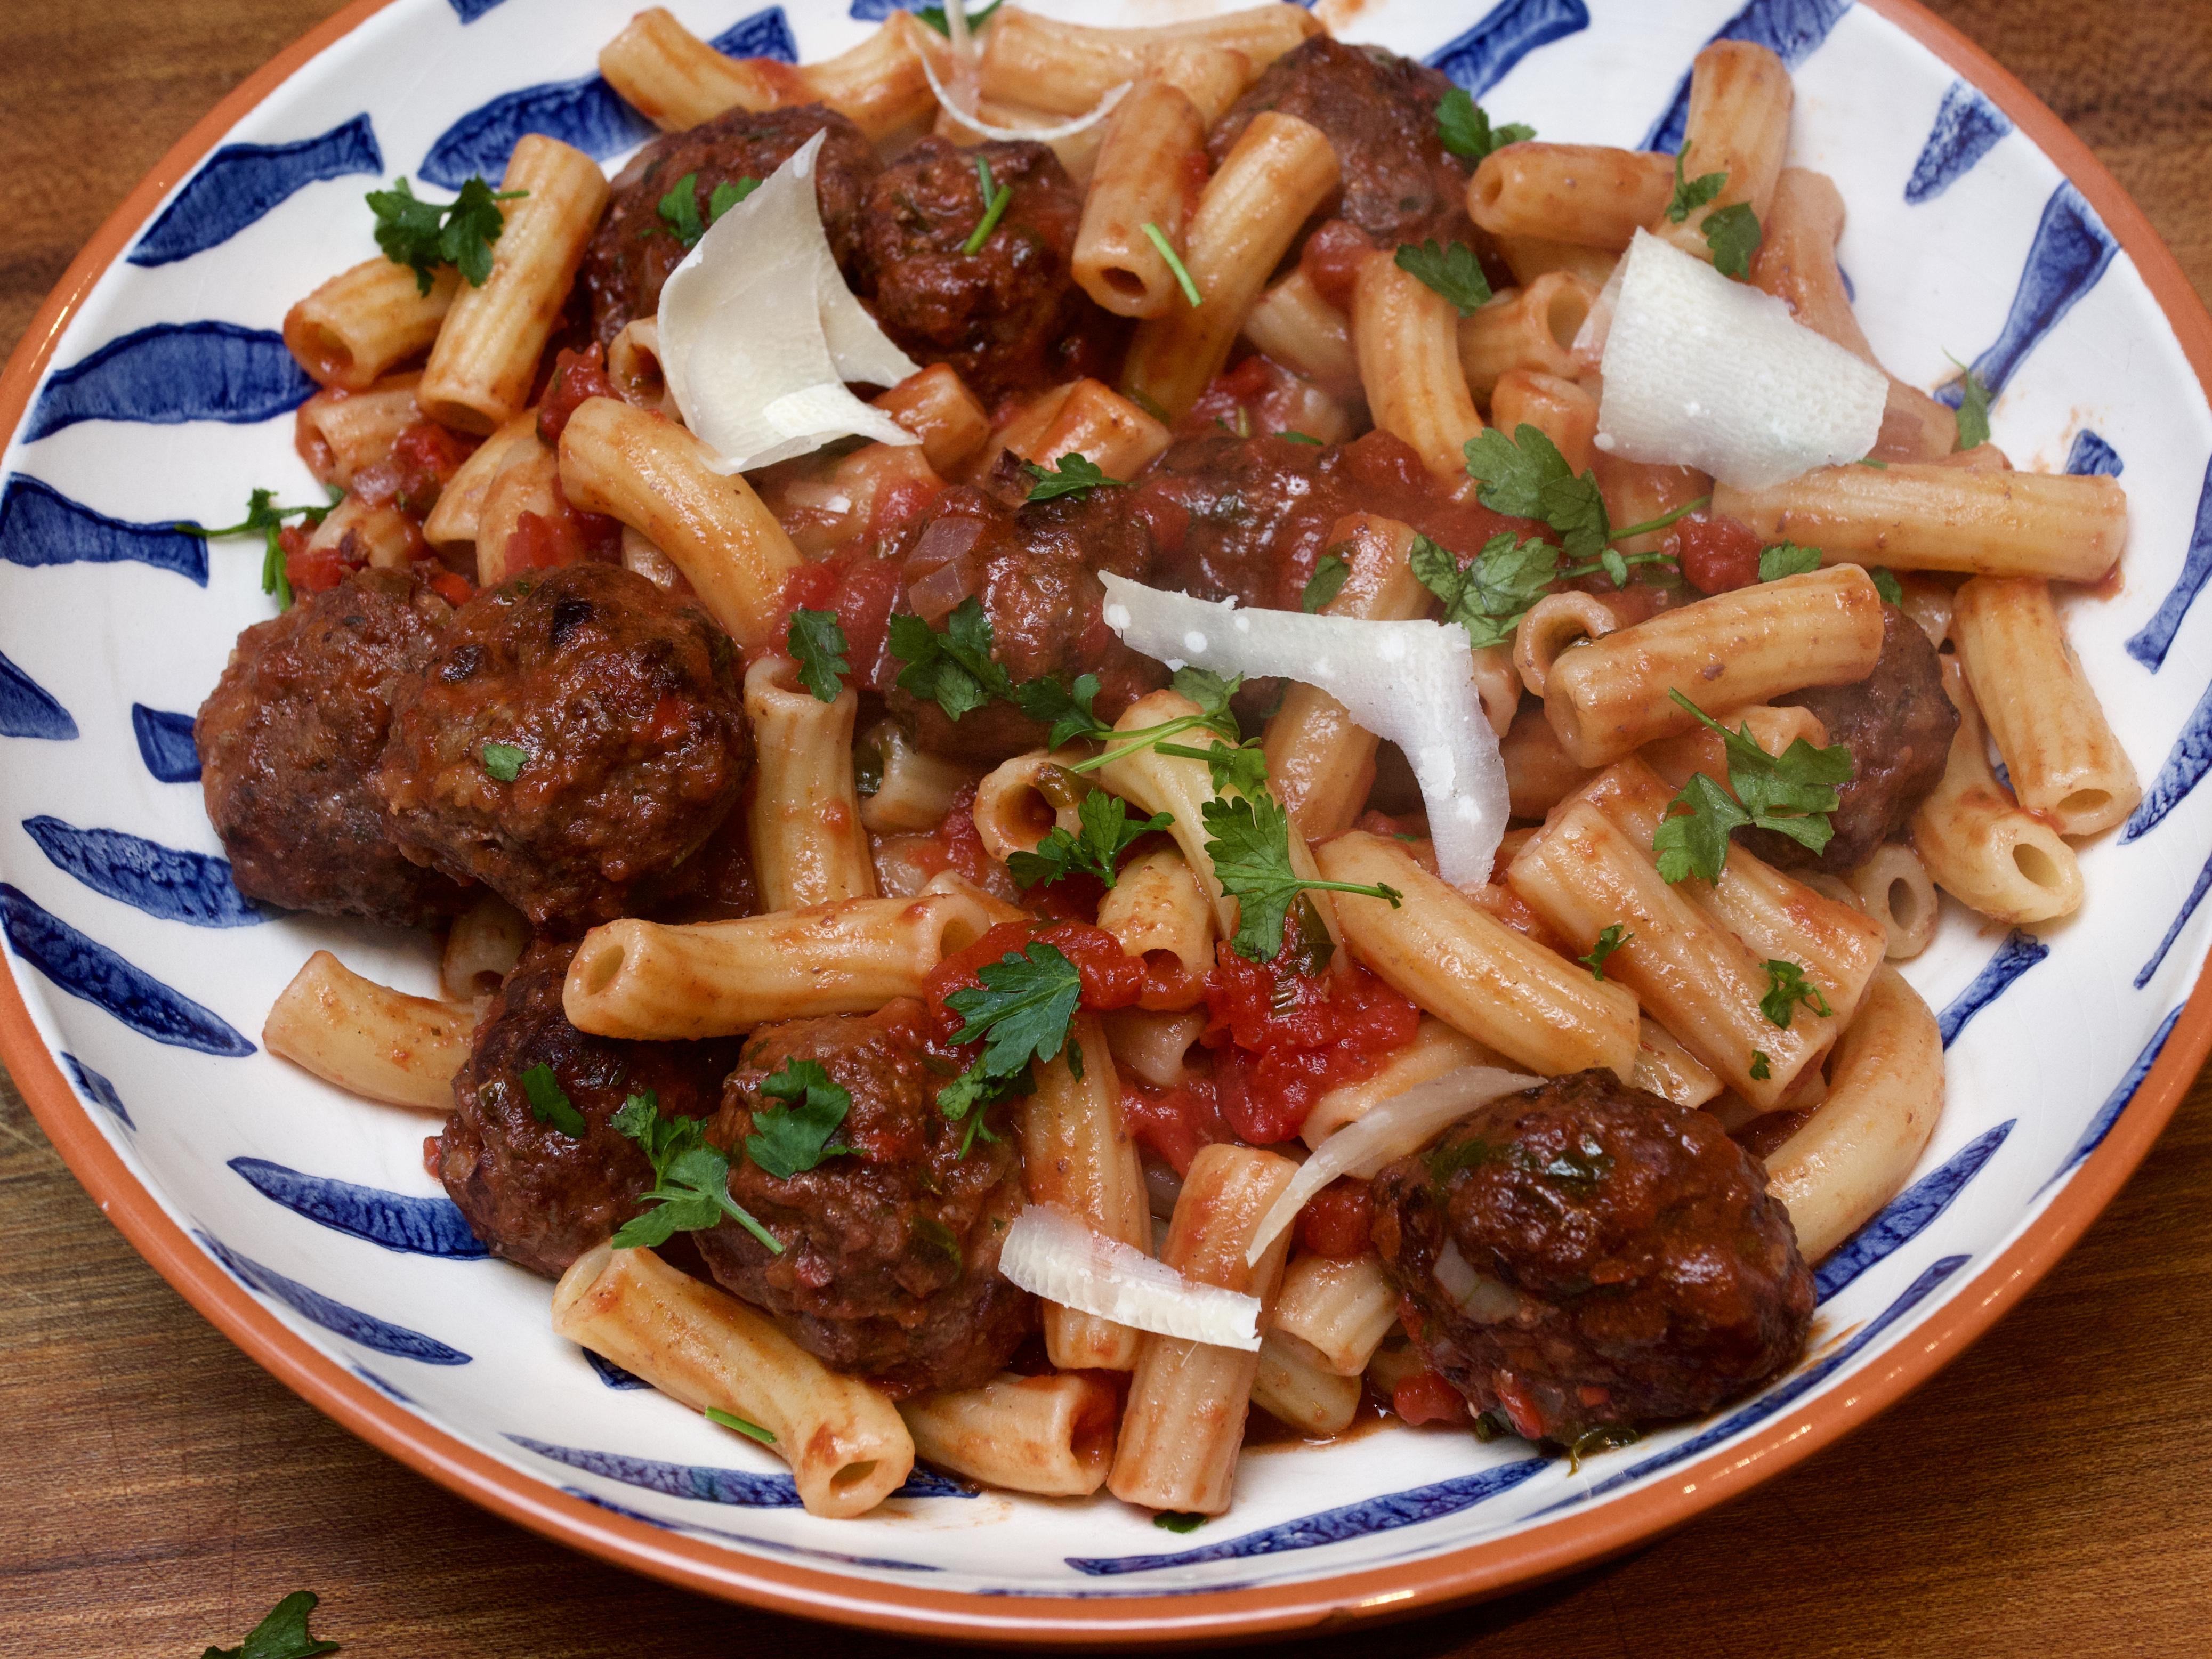 Chianti-baked Meatballs